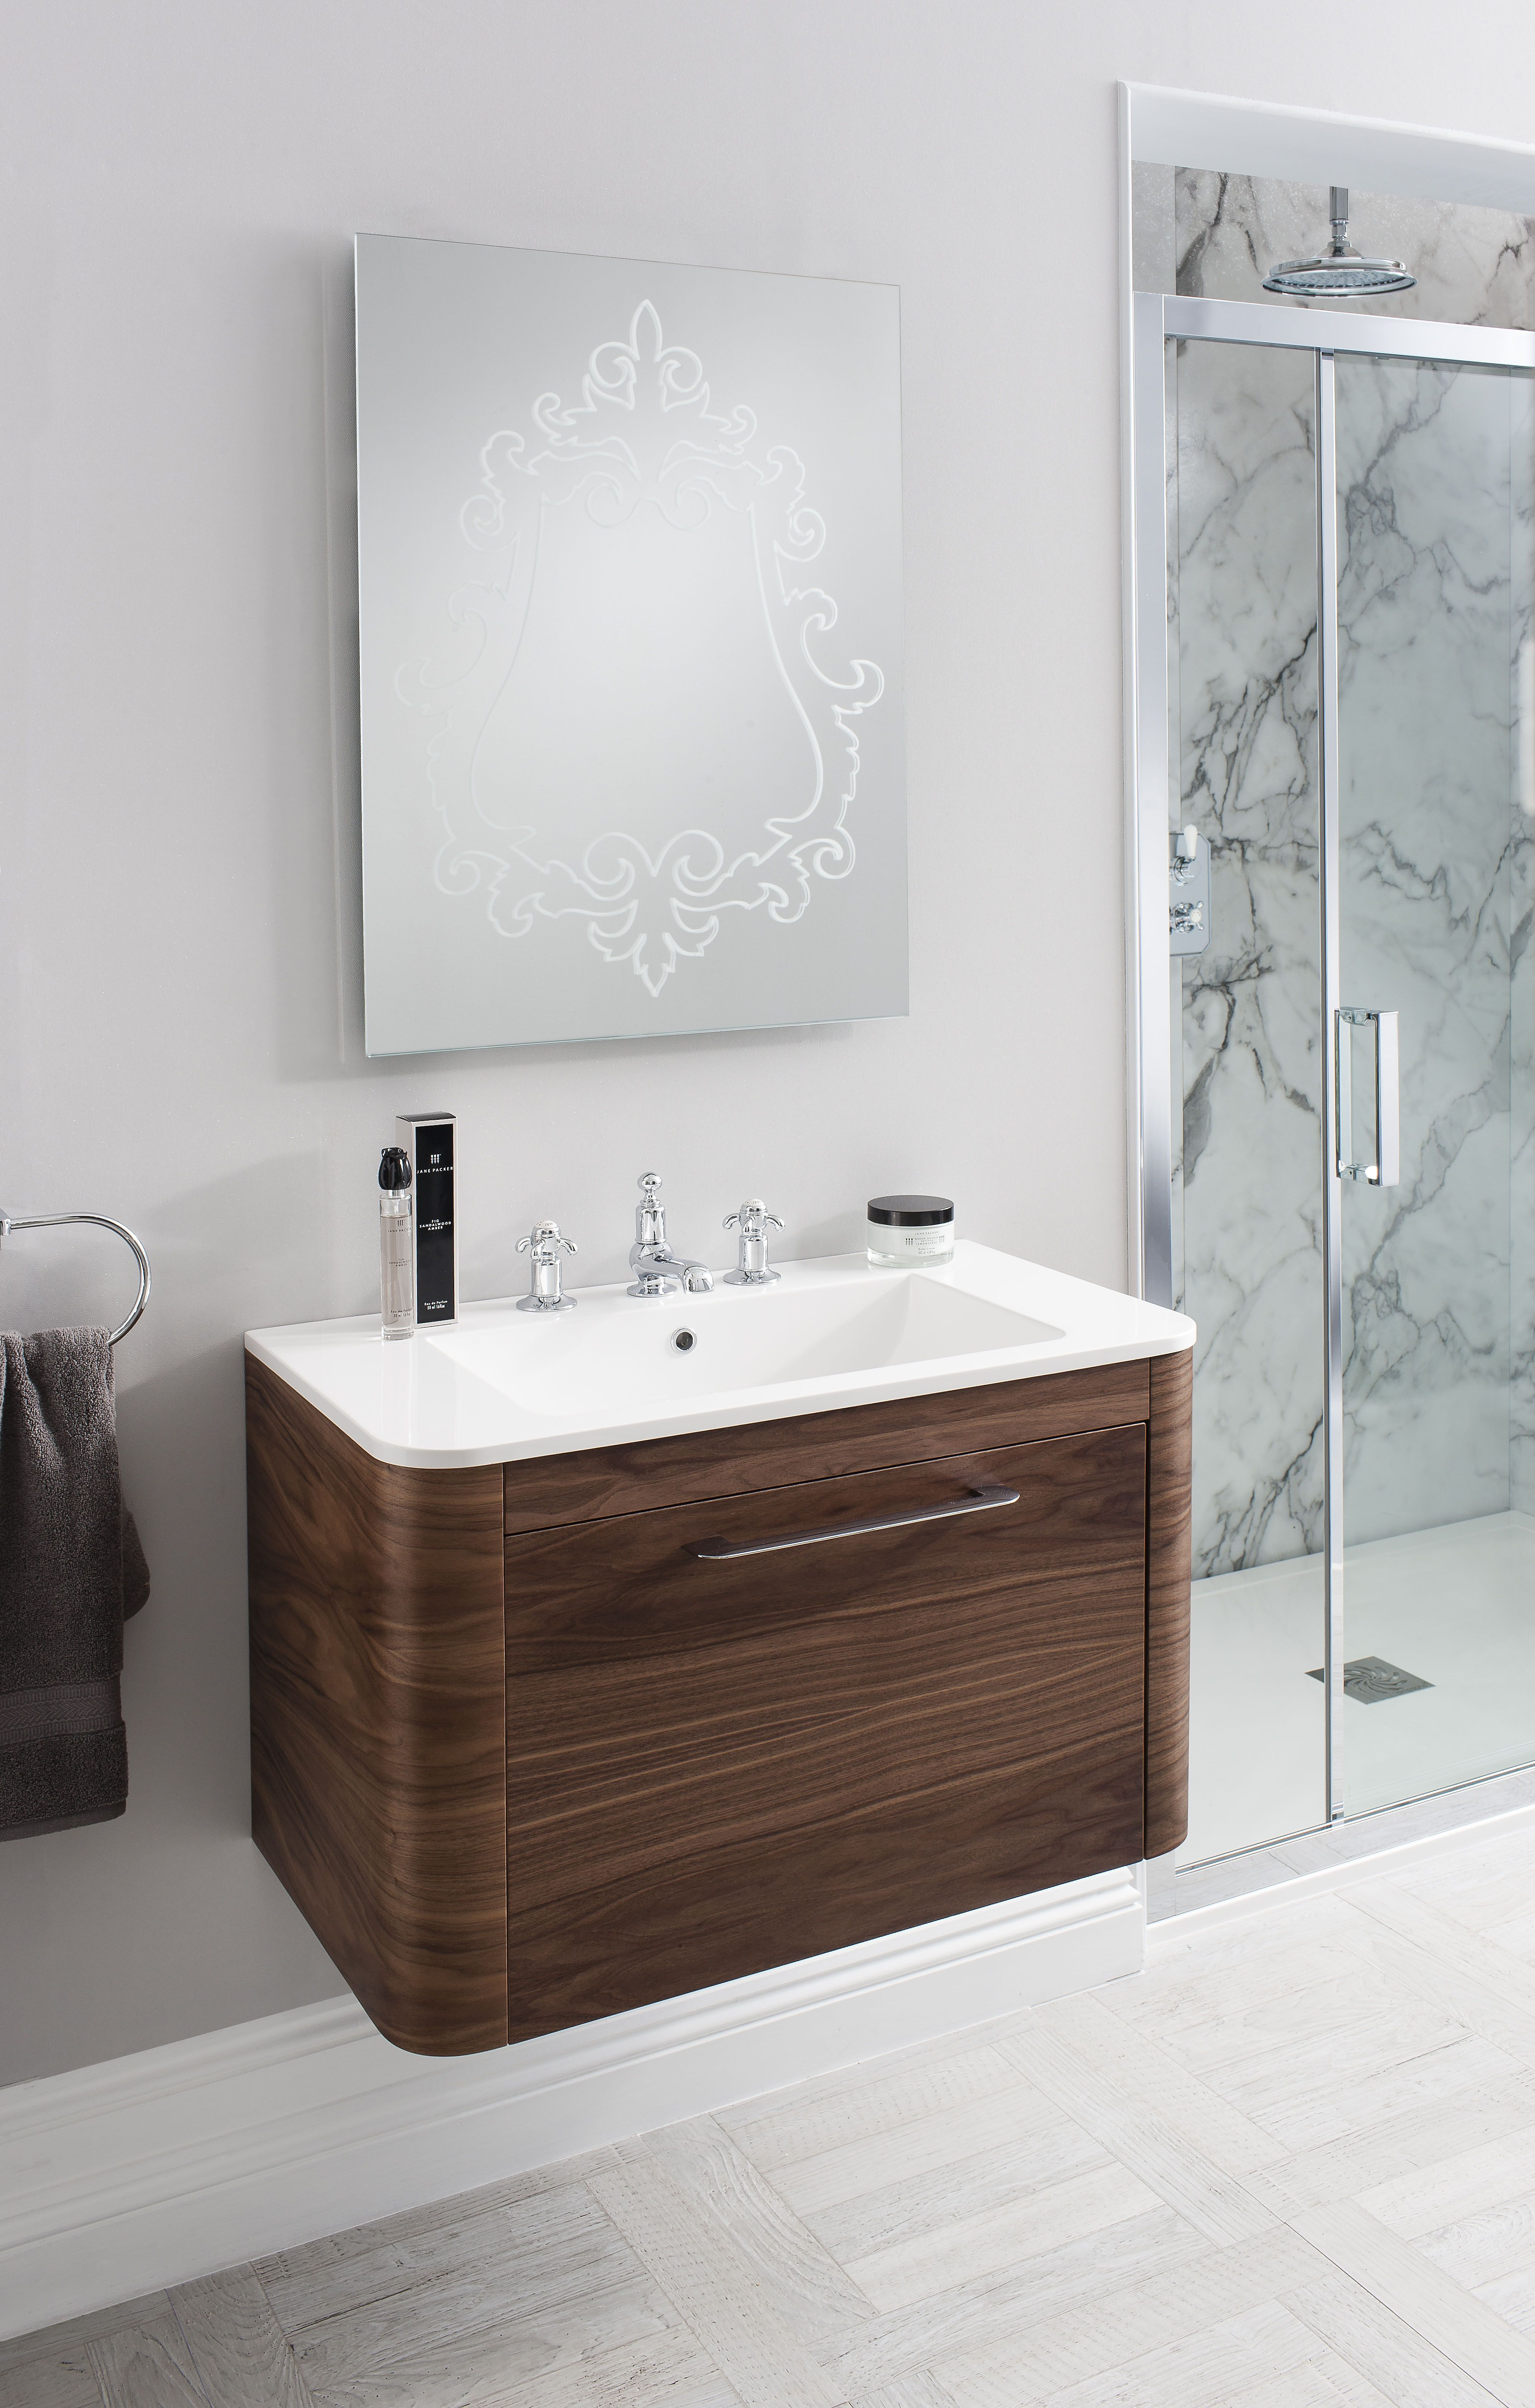 Celeste American Walnut Bathroom Furniture Unit & Basin from ...